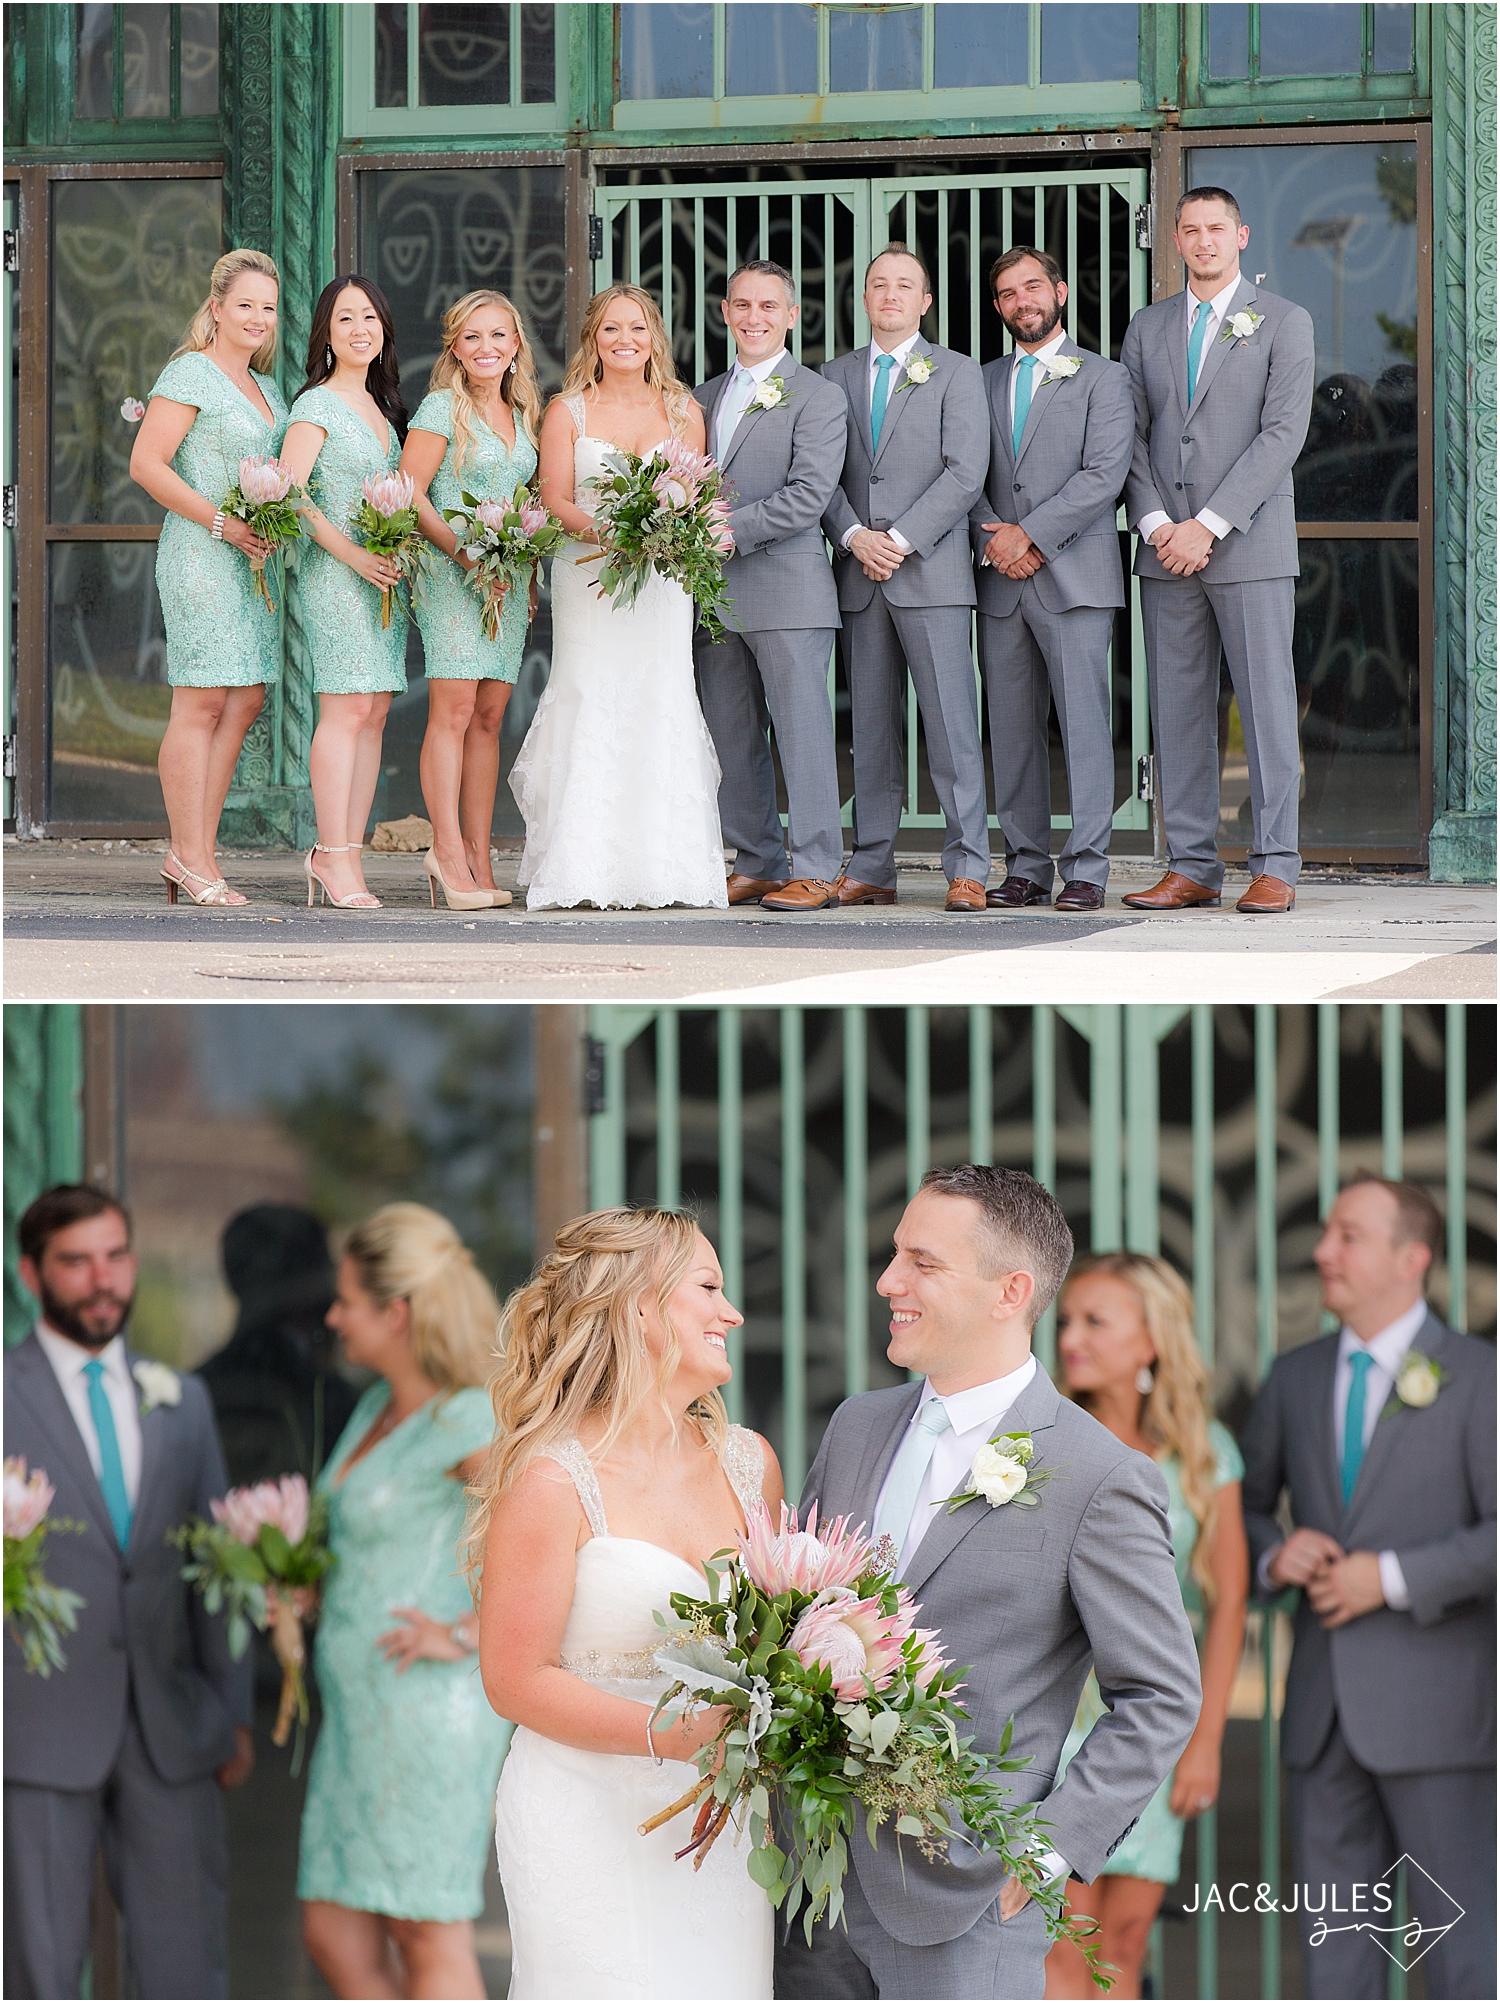 jacnjules photographs fun bridal party in Asbury Park, NJ